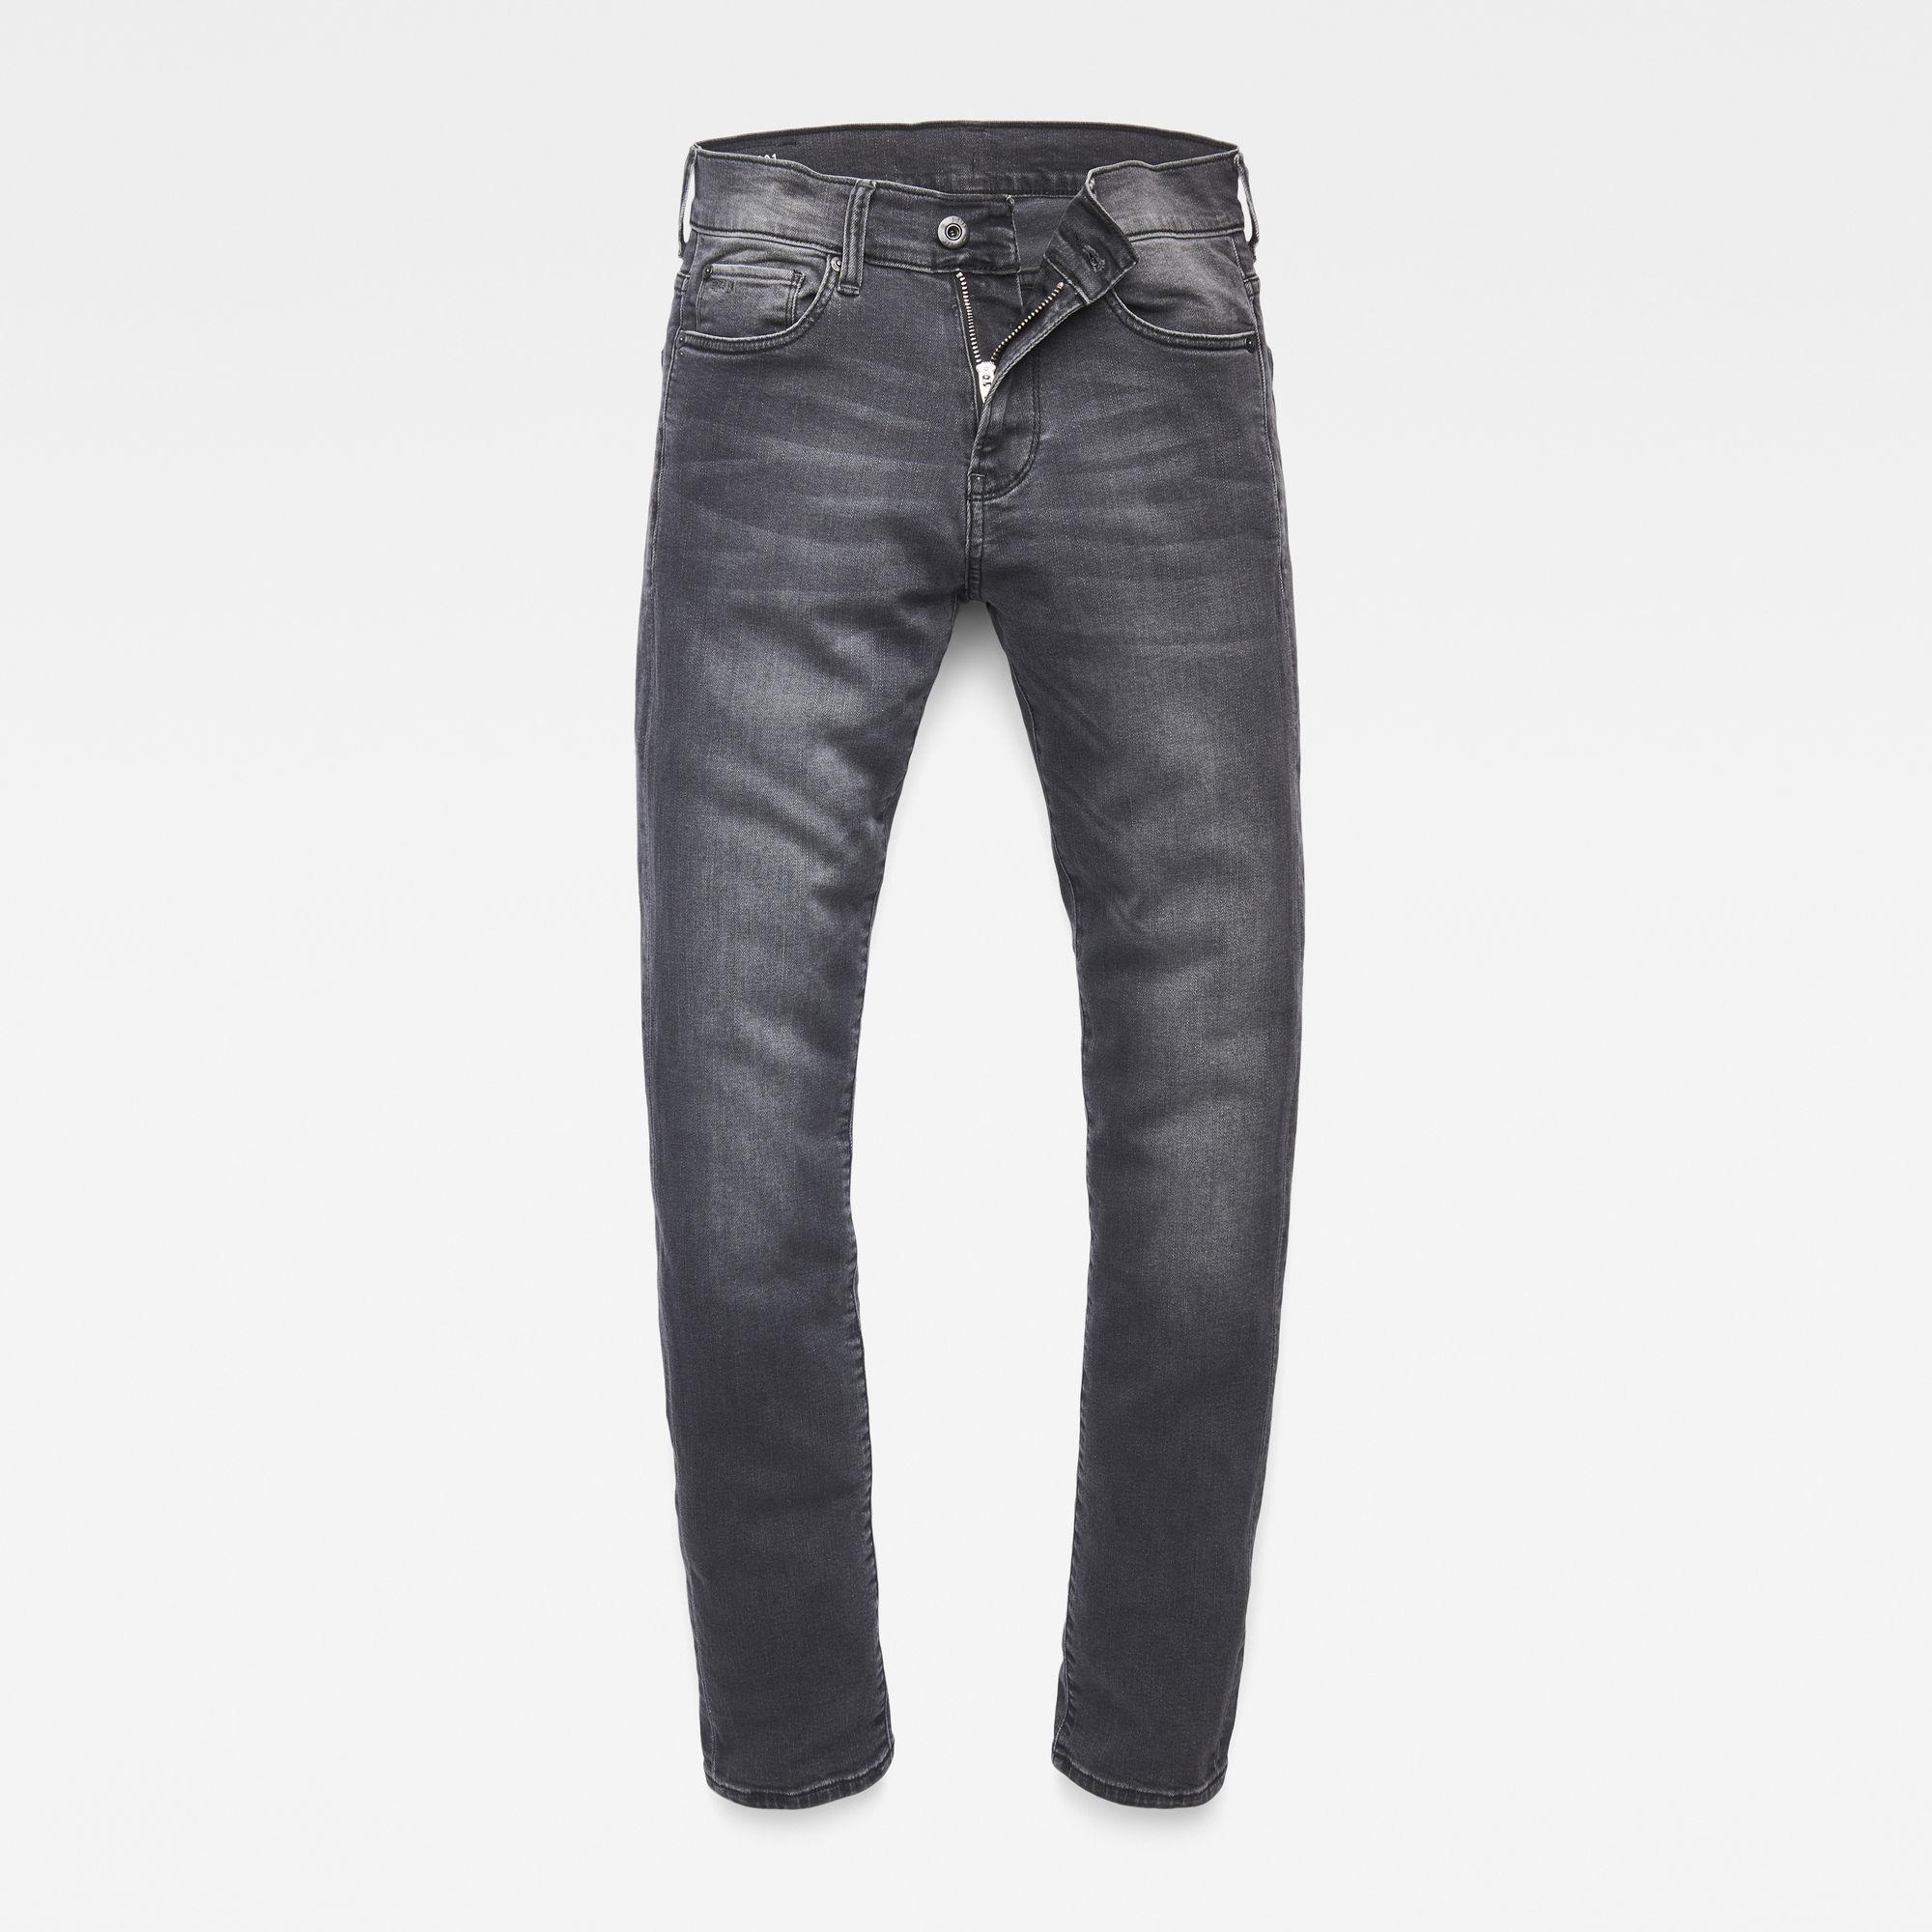 G-Star RAW Jongens 3301 Skinny Jeans Grijs